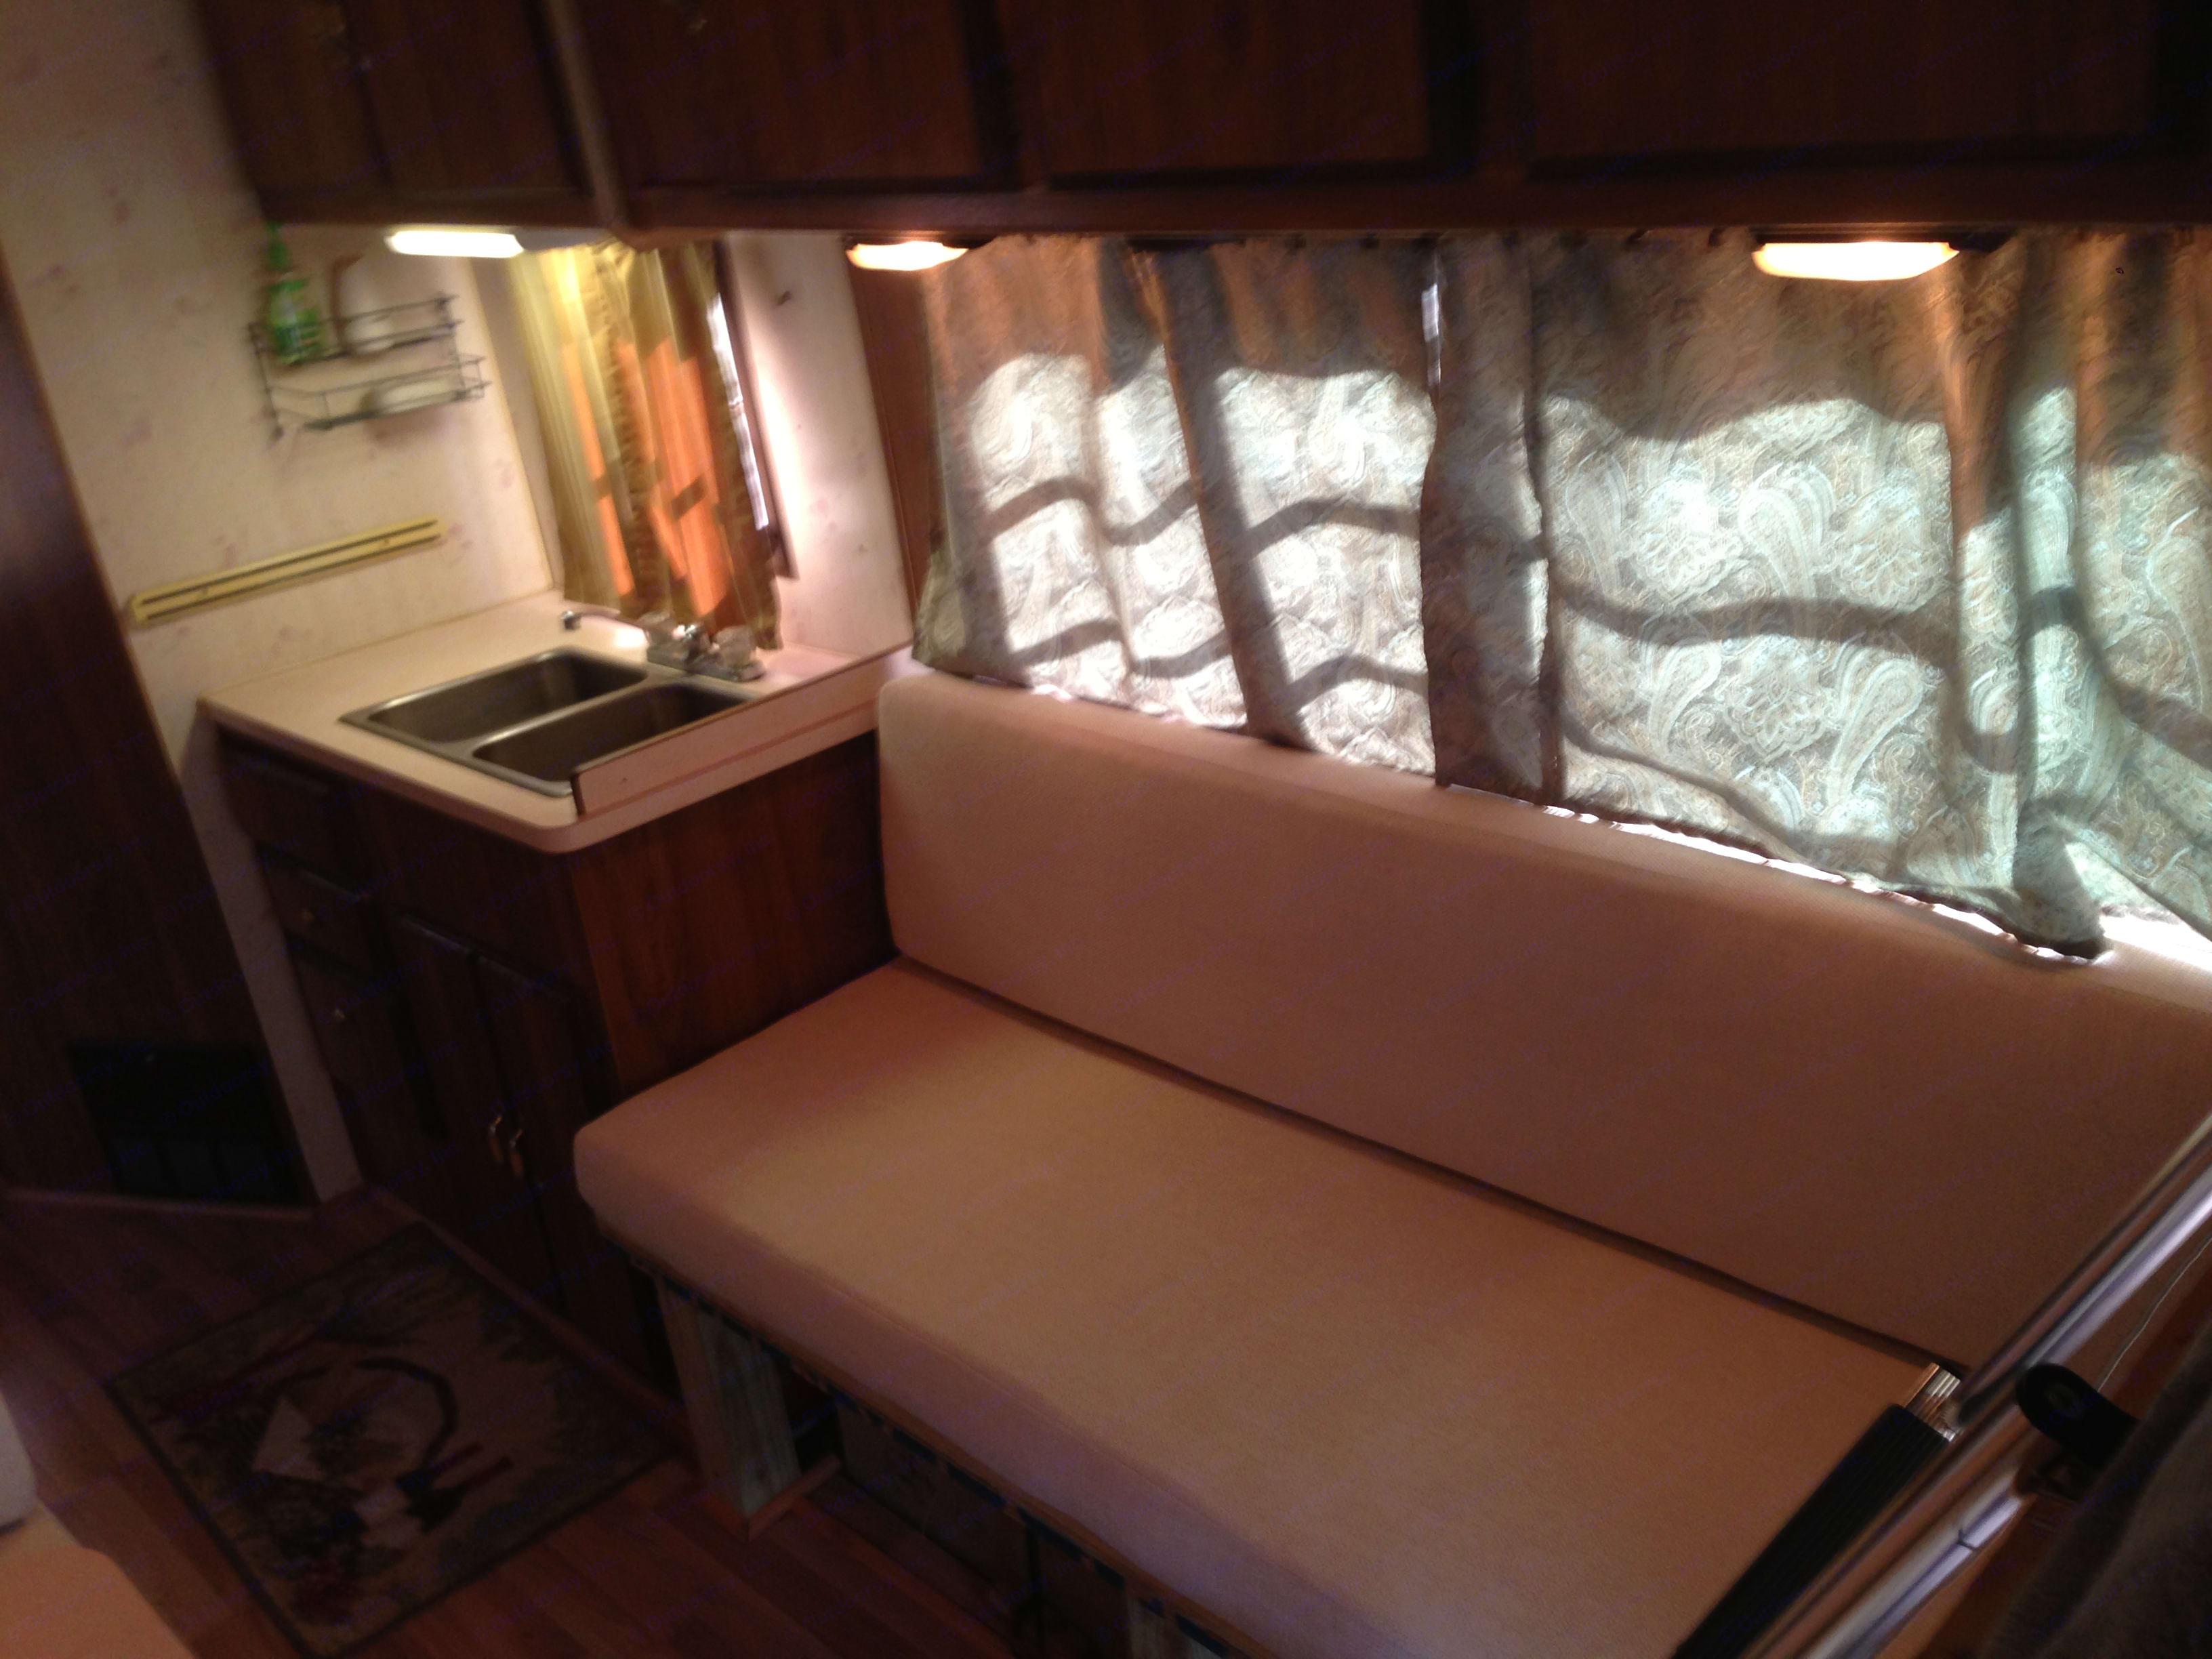 freshly upholstered sofa-sleeper, new elegant curtains! . Coachmen Catalina 1989